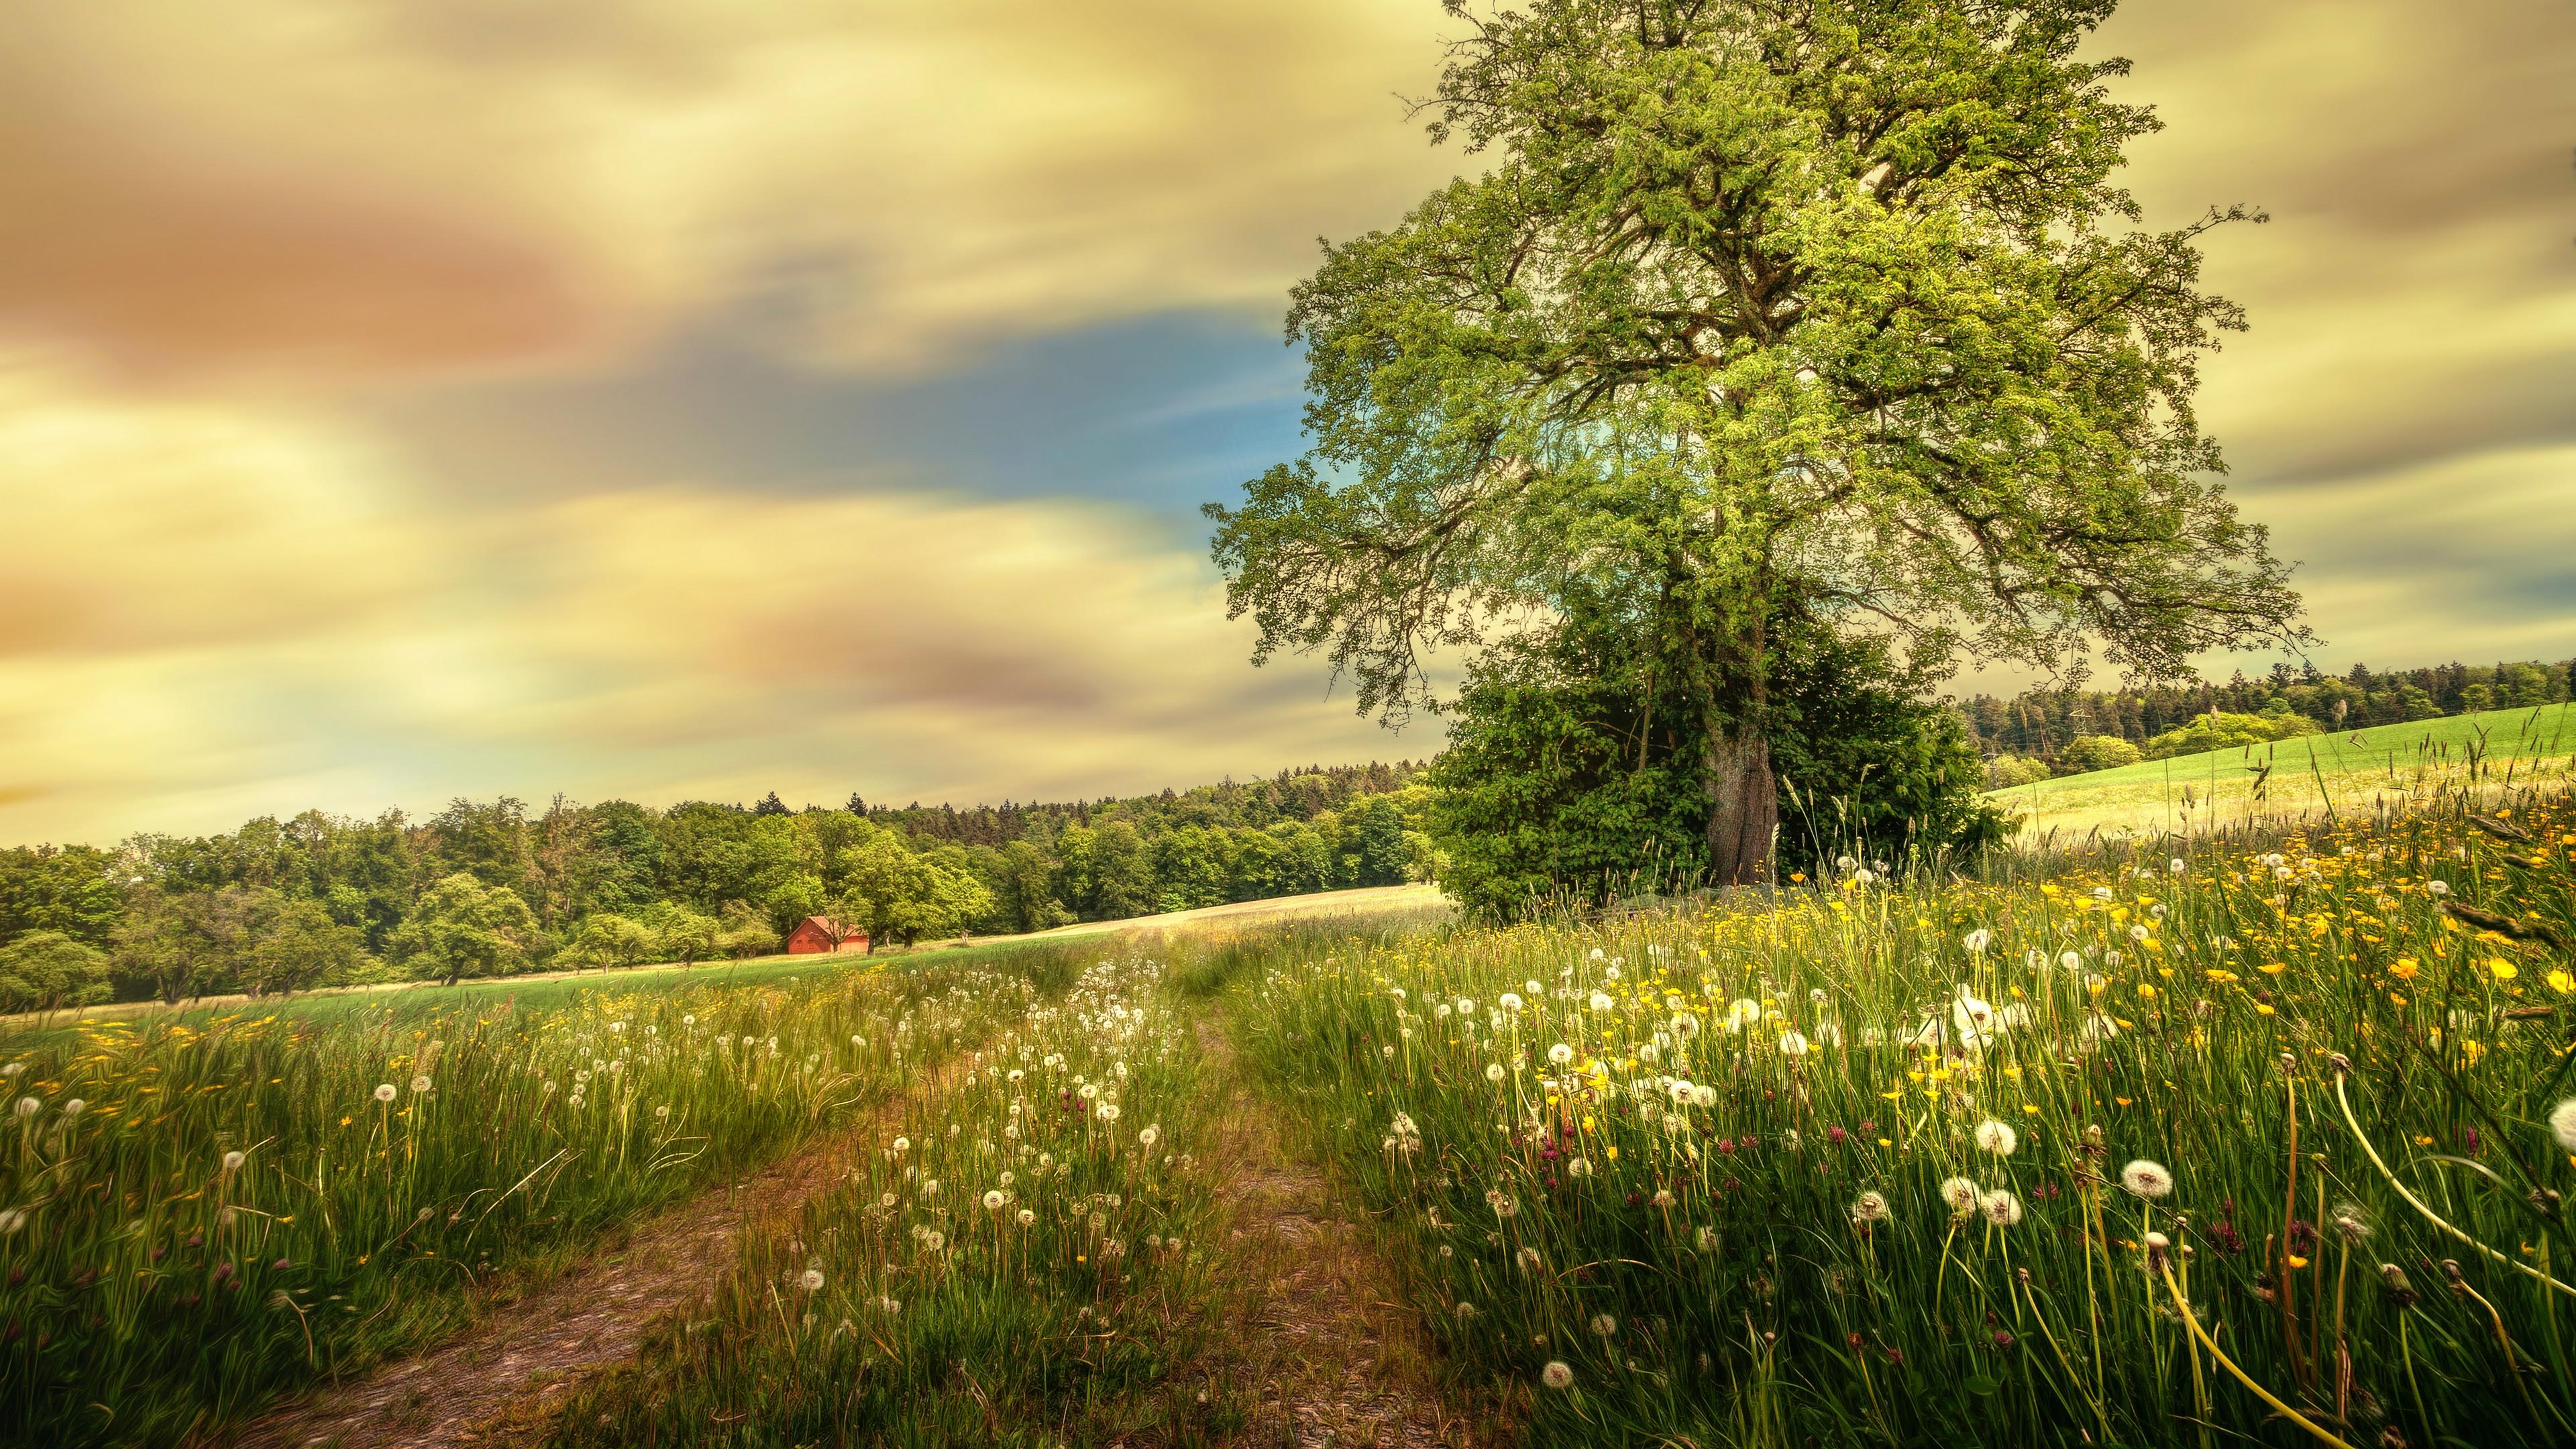 зелень лето поле лес greens summer field forest без регистрации